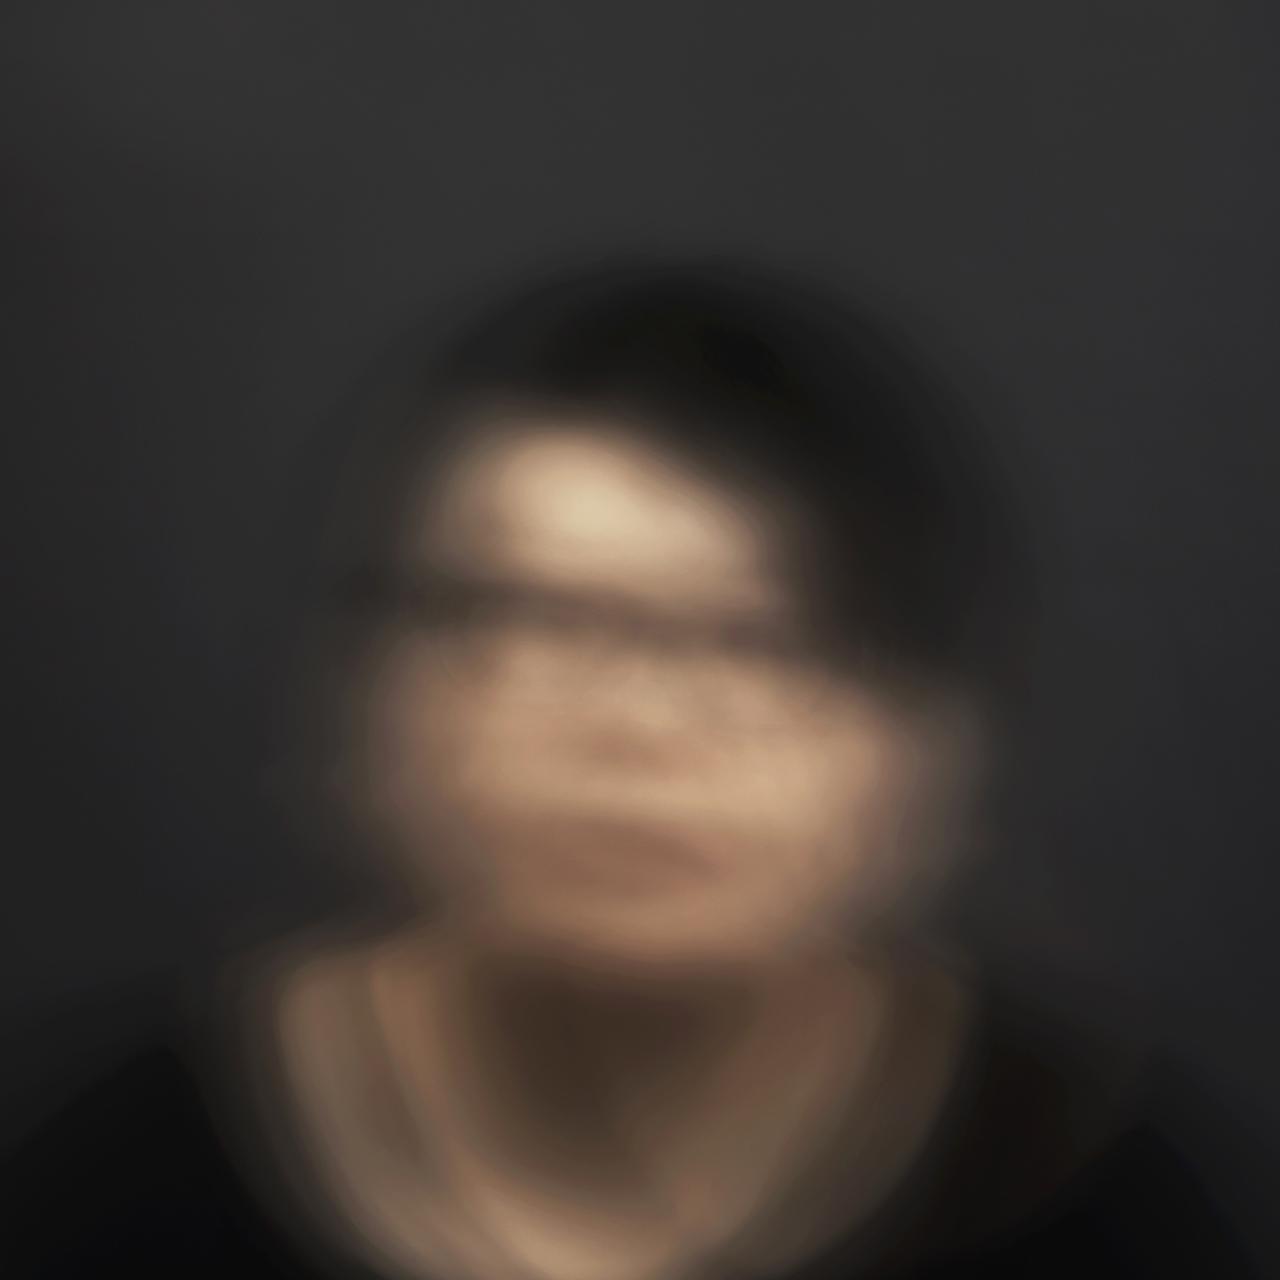 CYRUS TANG   Shower (92 minutes)  2018 Archival pigment print 65 x 65 cm